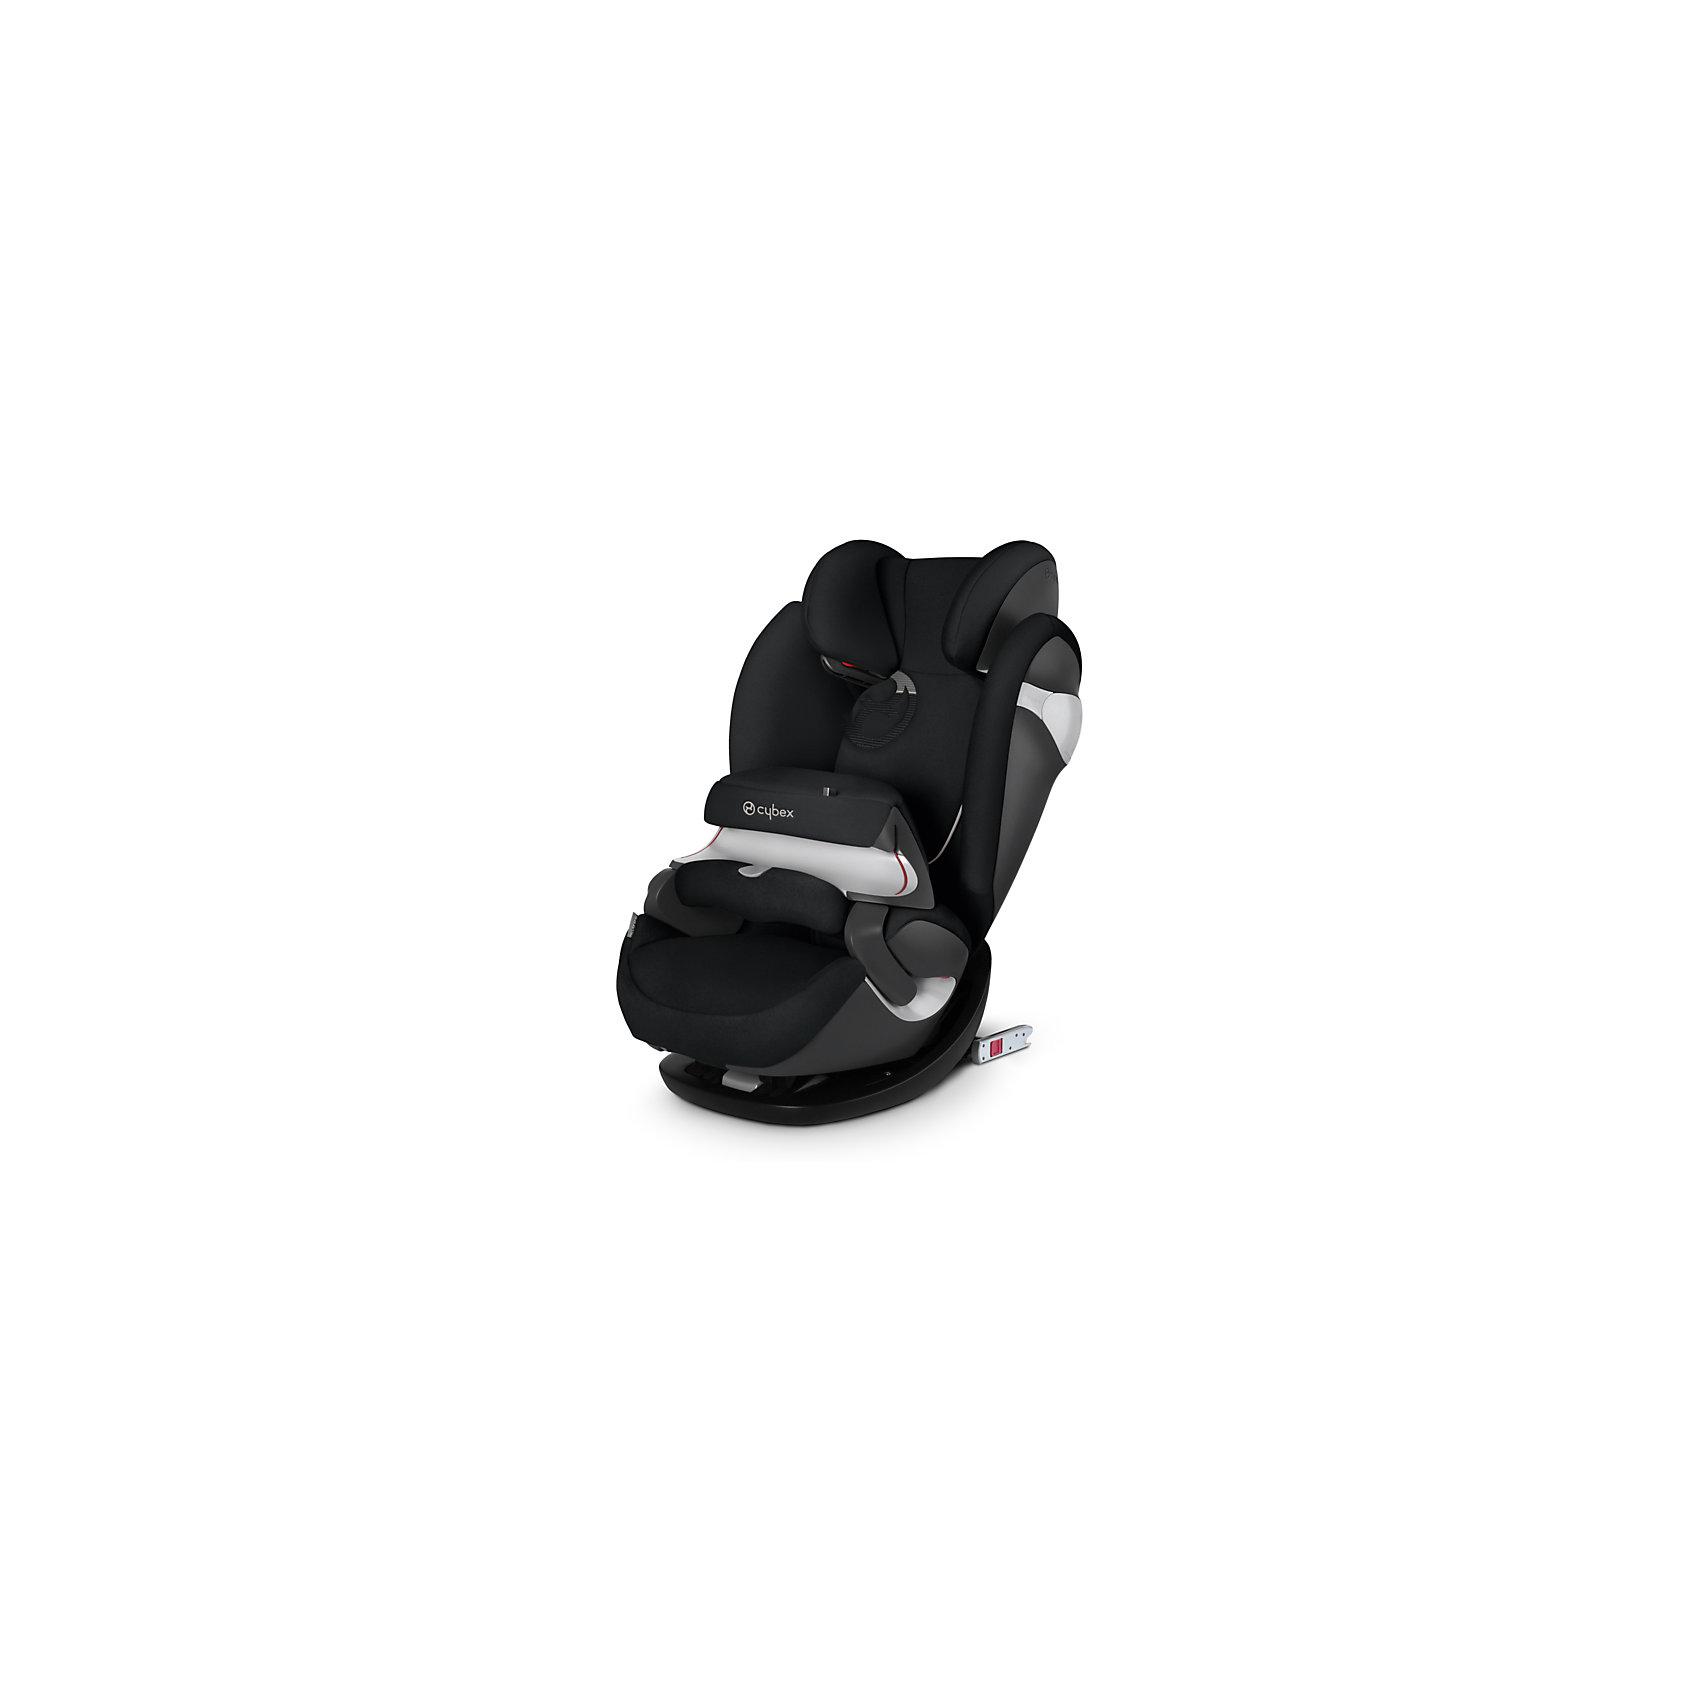 Автокресло Cybex Pallas M-Fix, 9-36 кг, Stardust Black